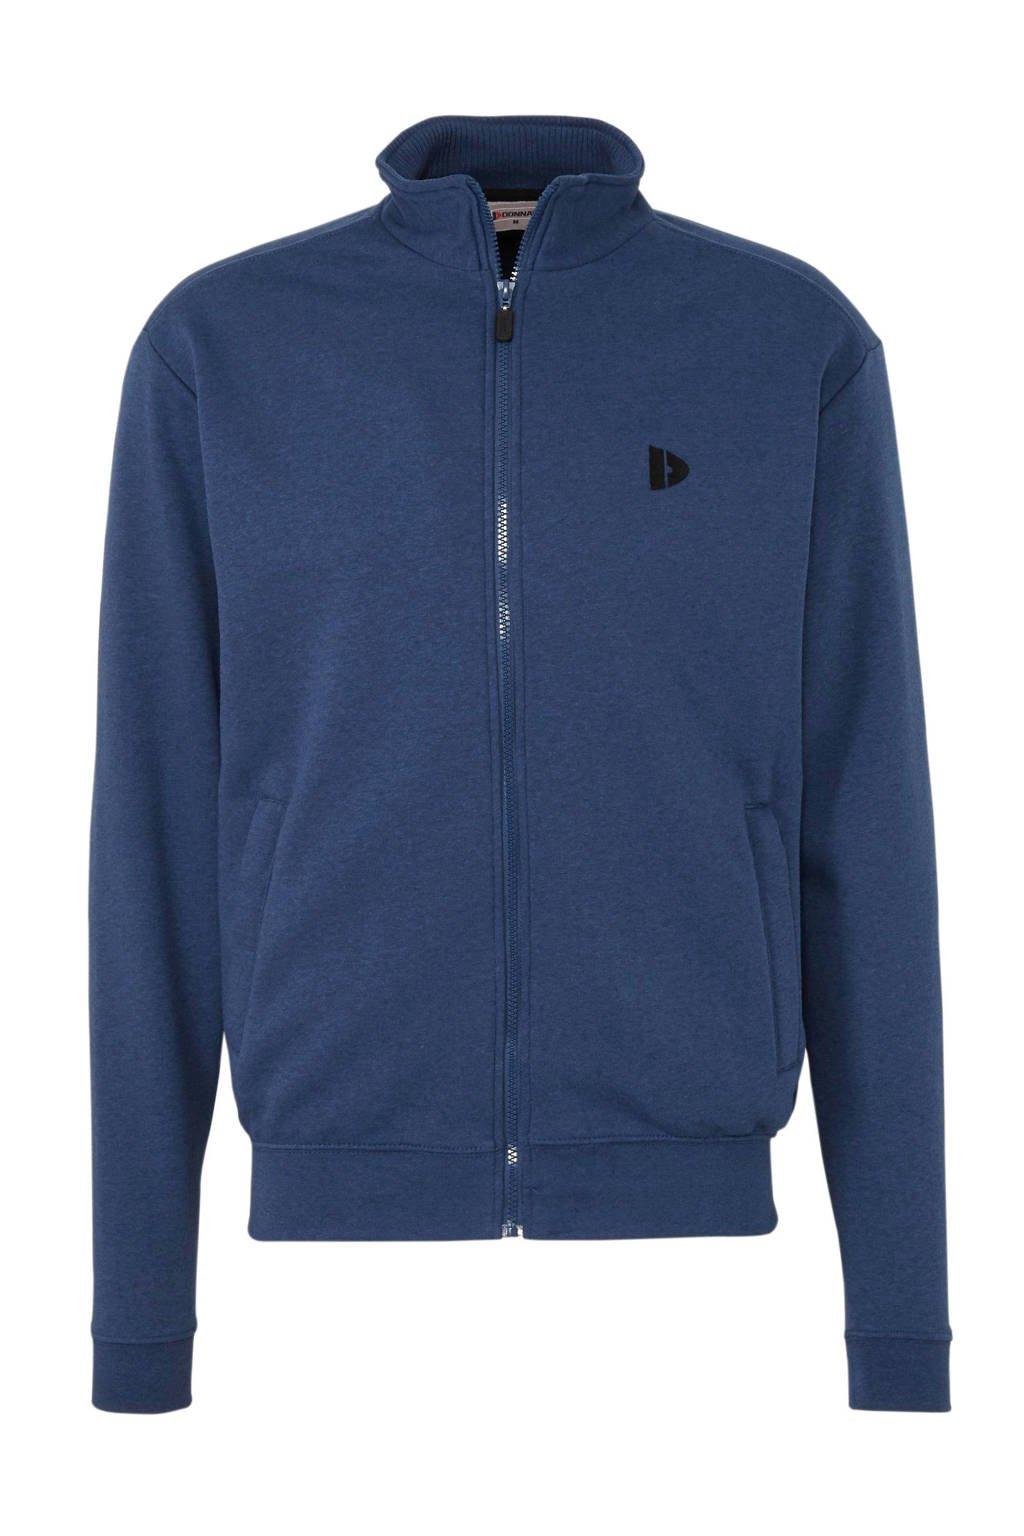 Donnay   sportvest blauw gemeleerd, blauw melange